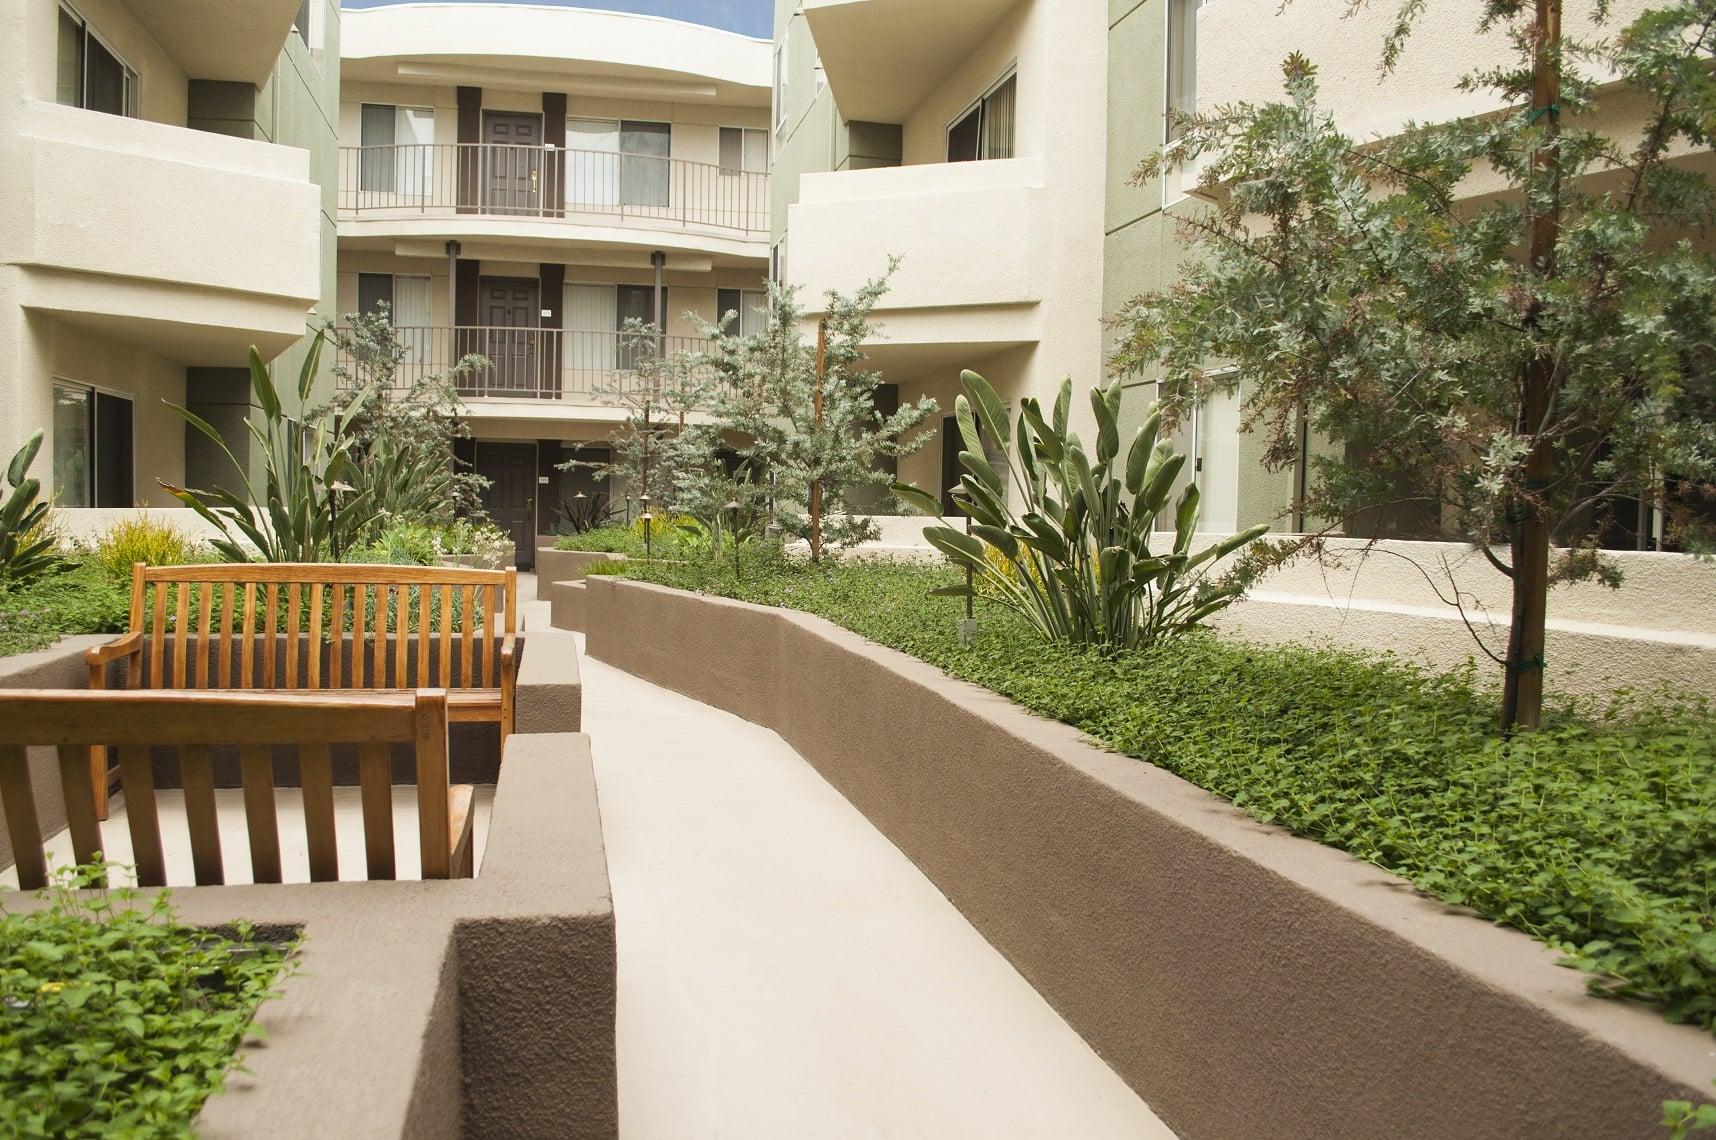 Beautiful courtyard at The Ritz in Studio City, California